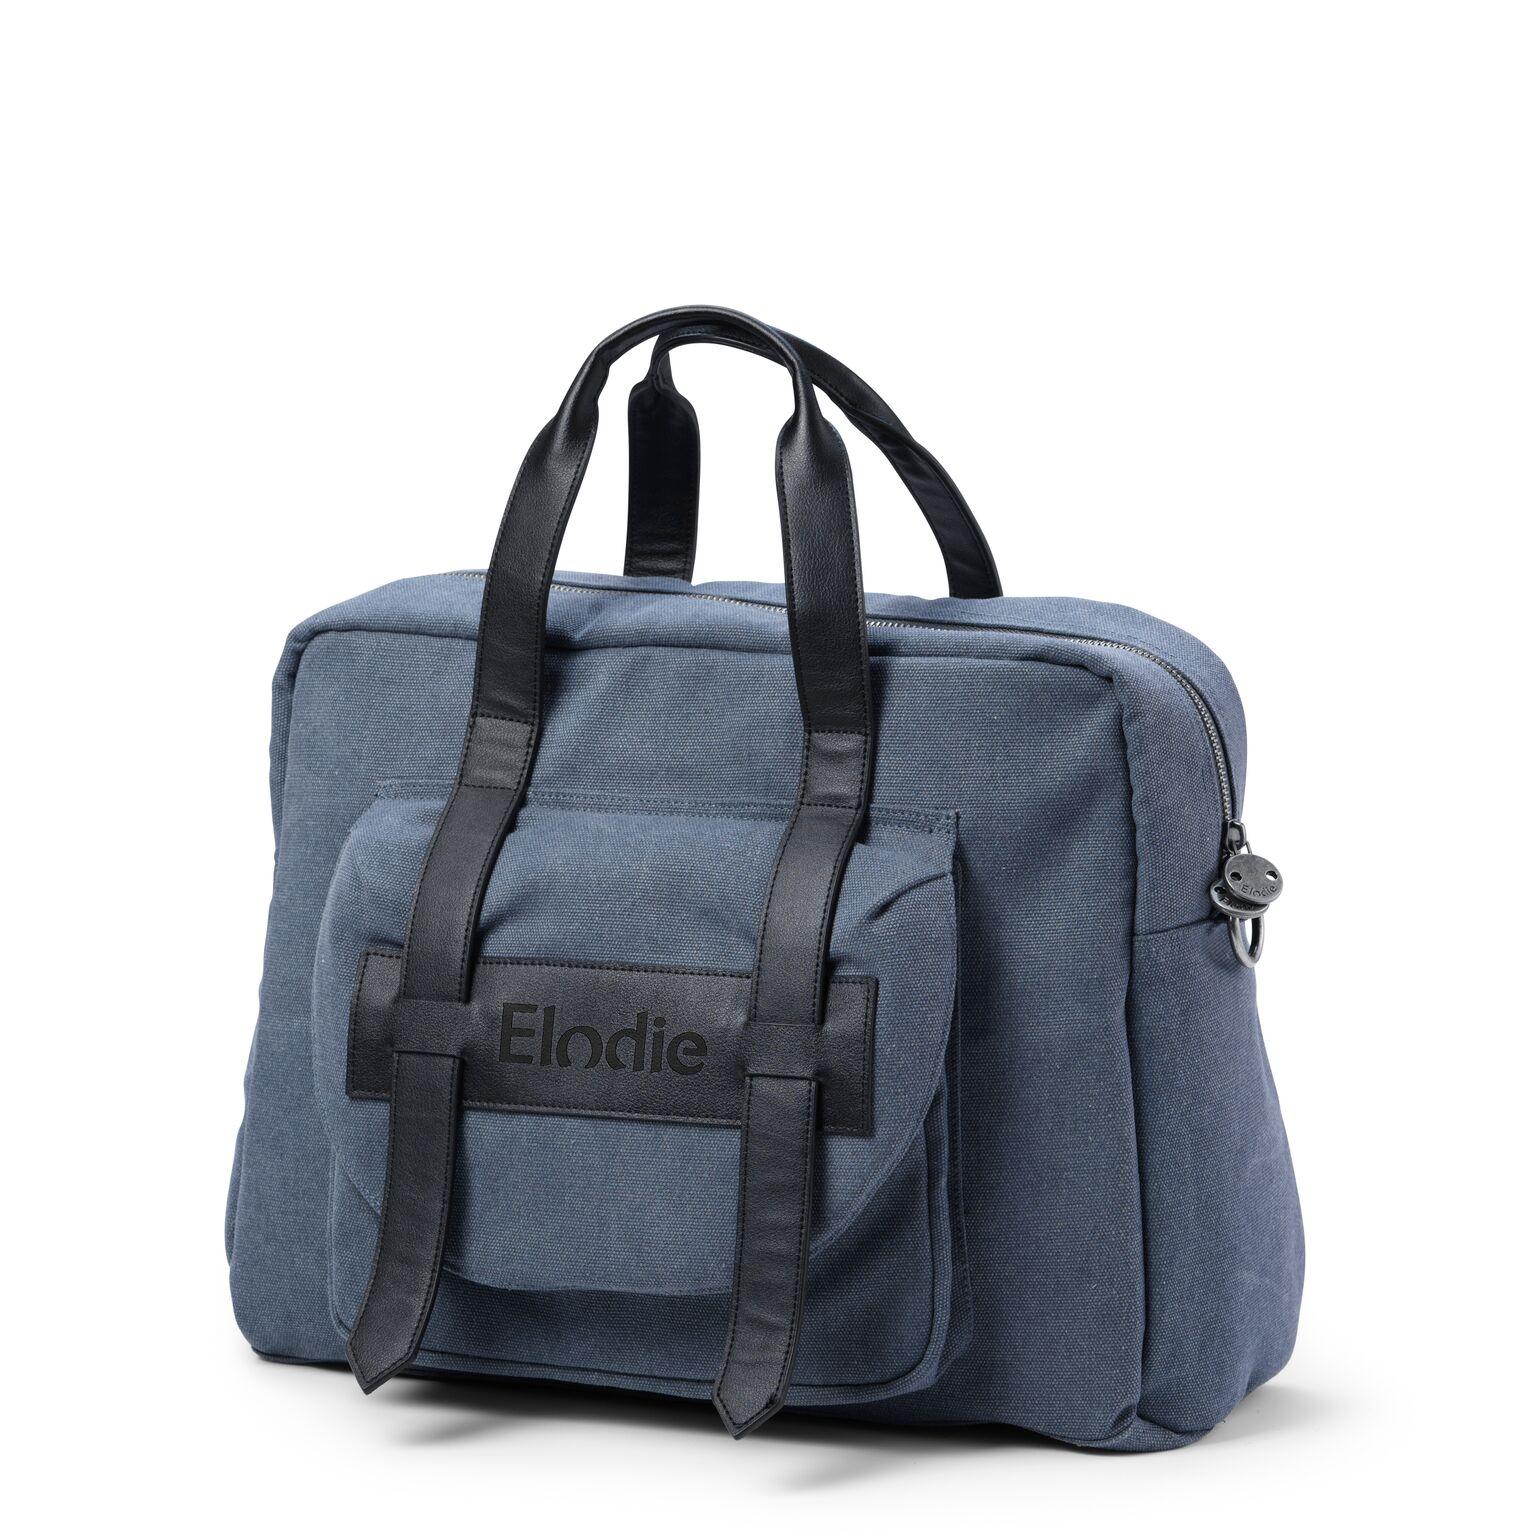 Elodie Details - Changing Bag Signature Edition - Juniper Blue